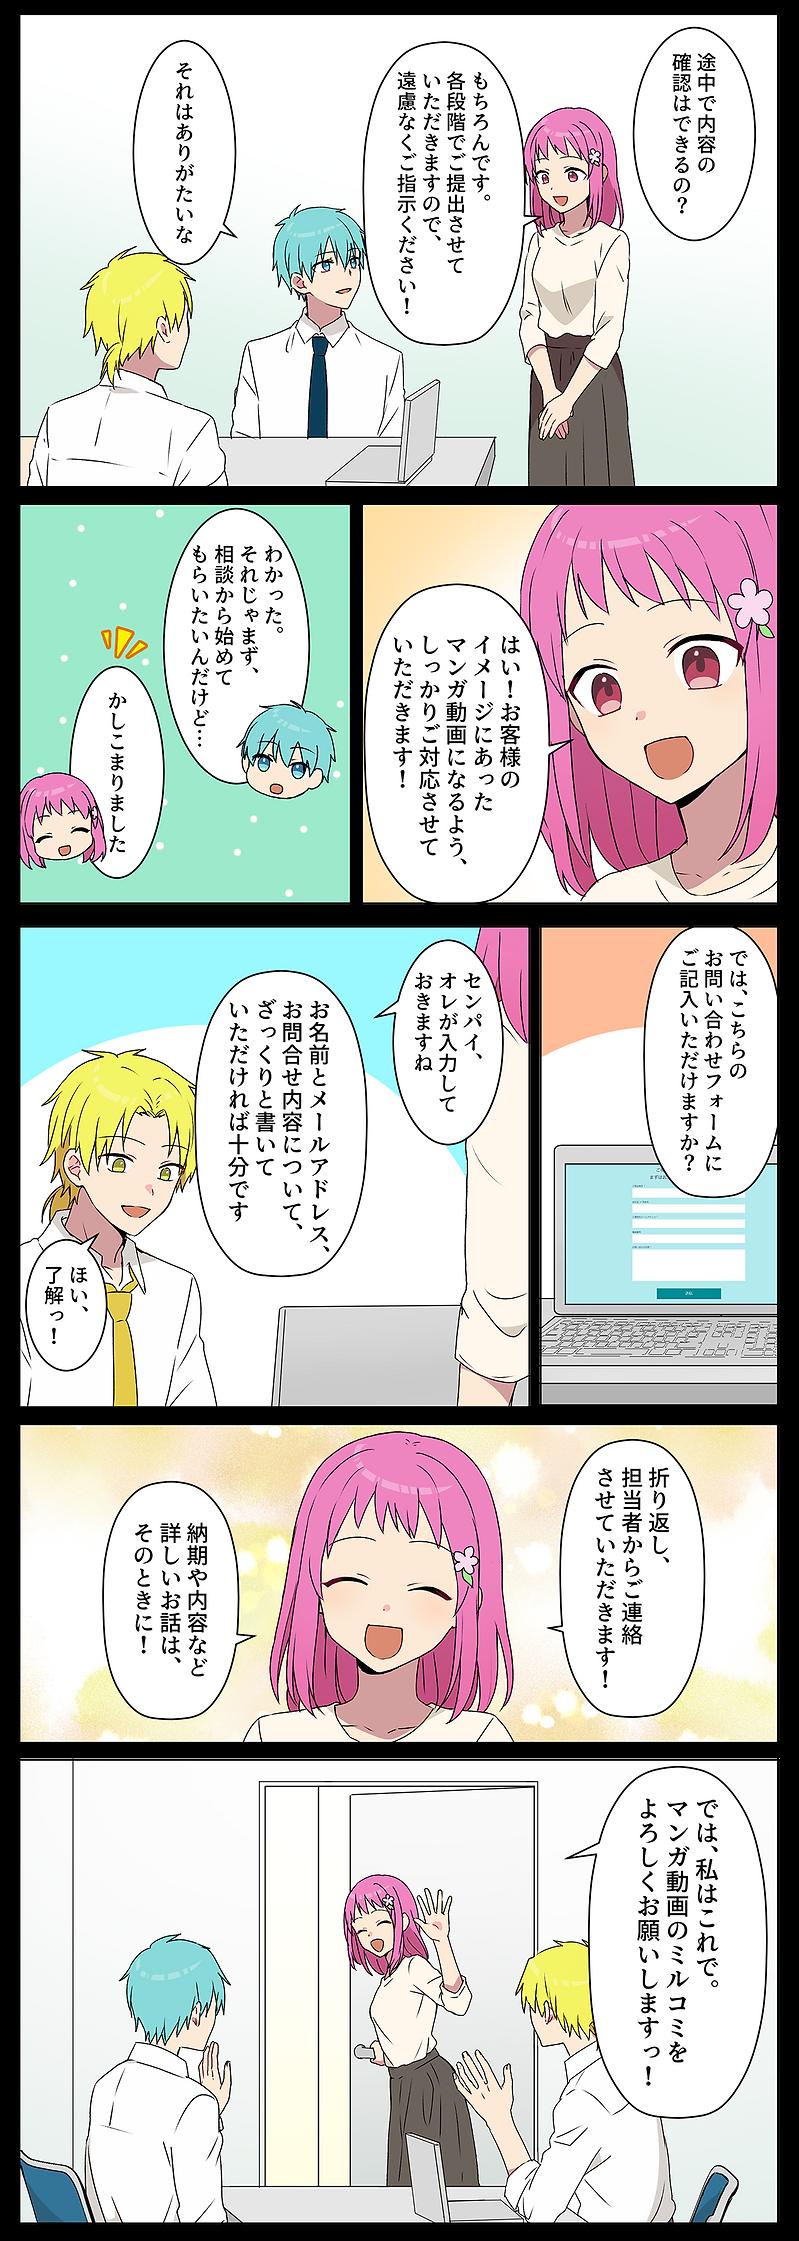 manga05.png